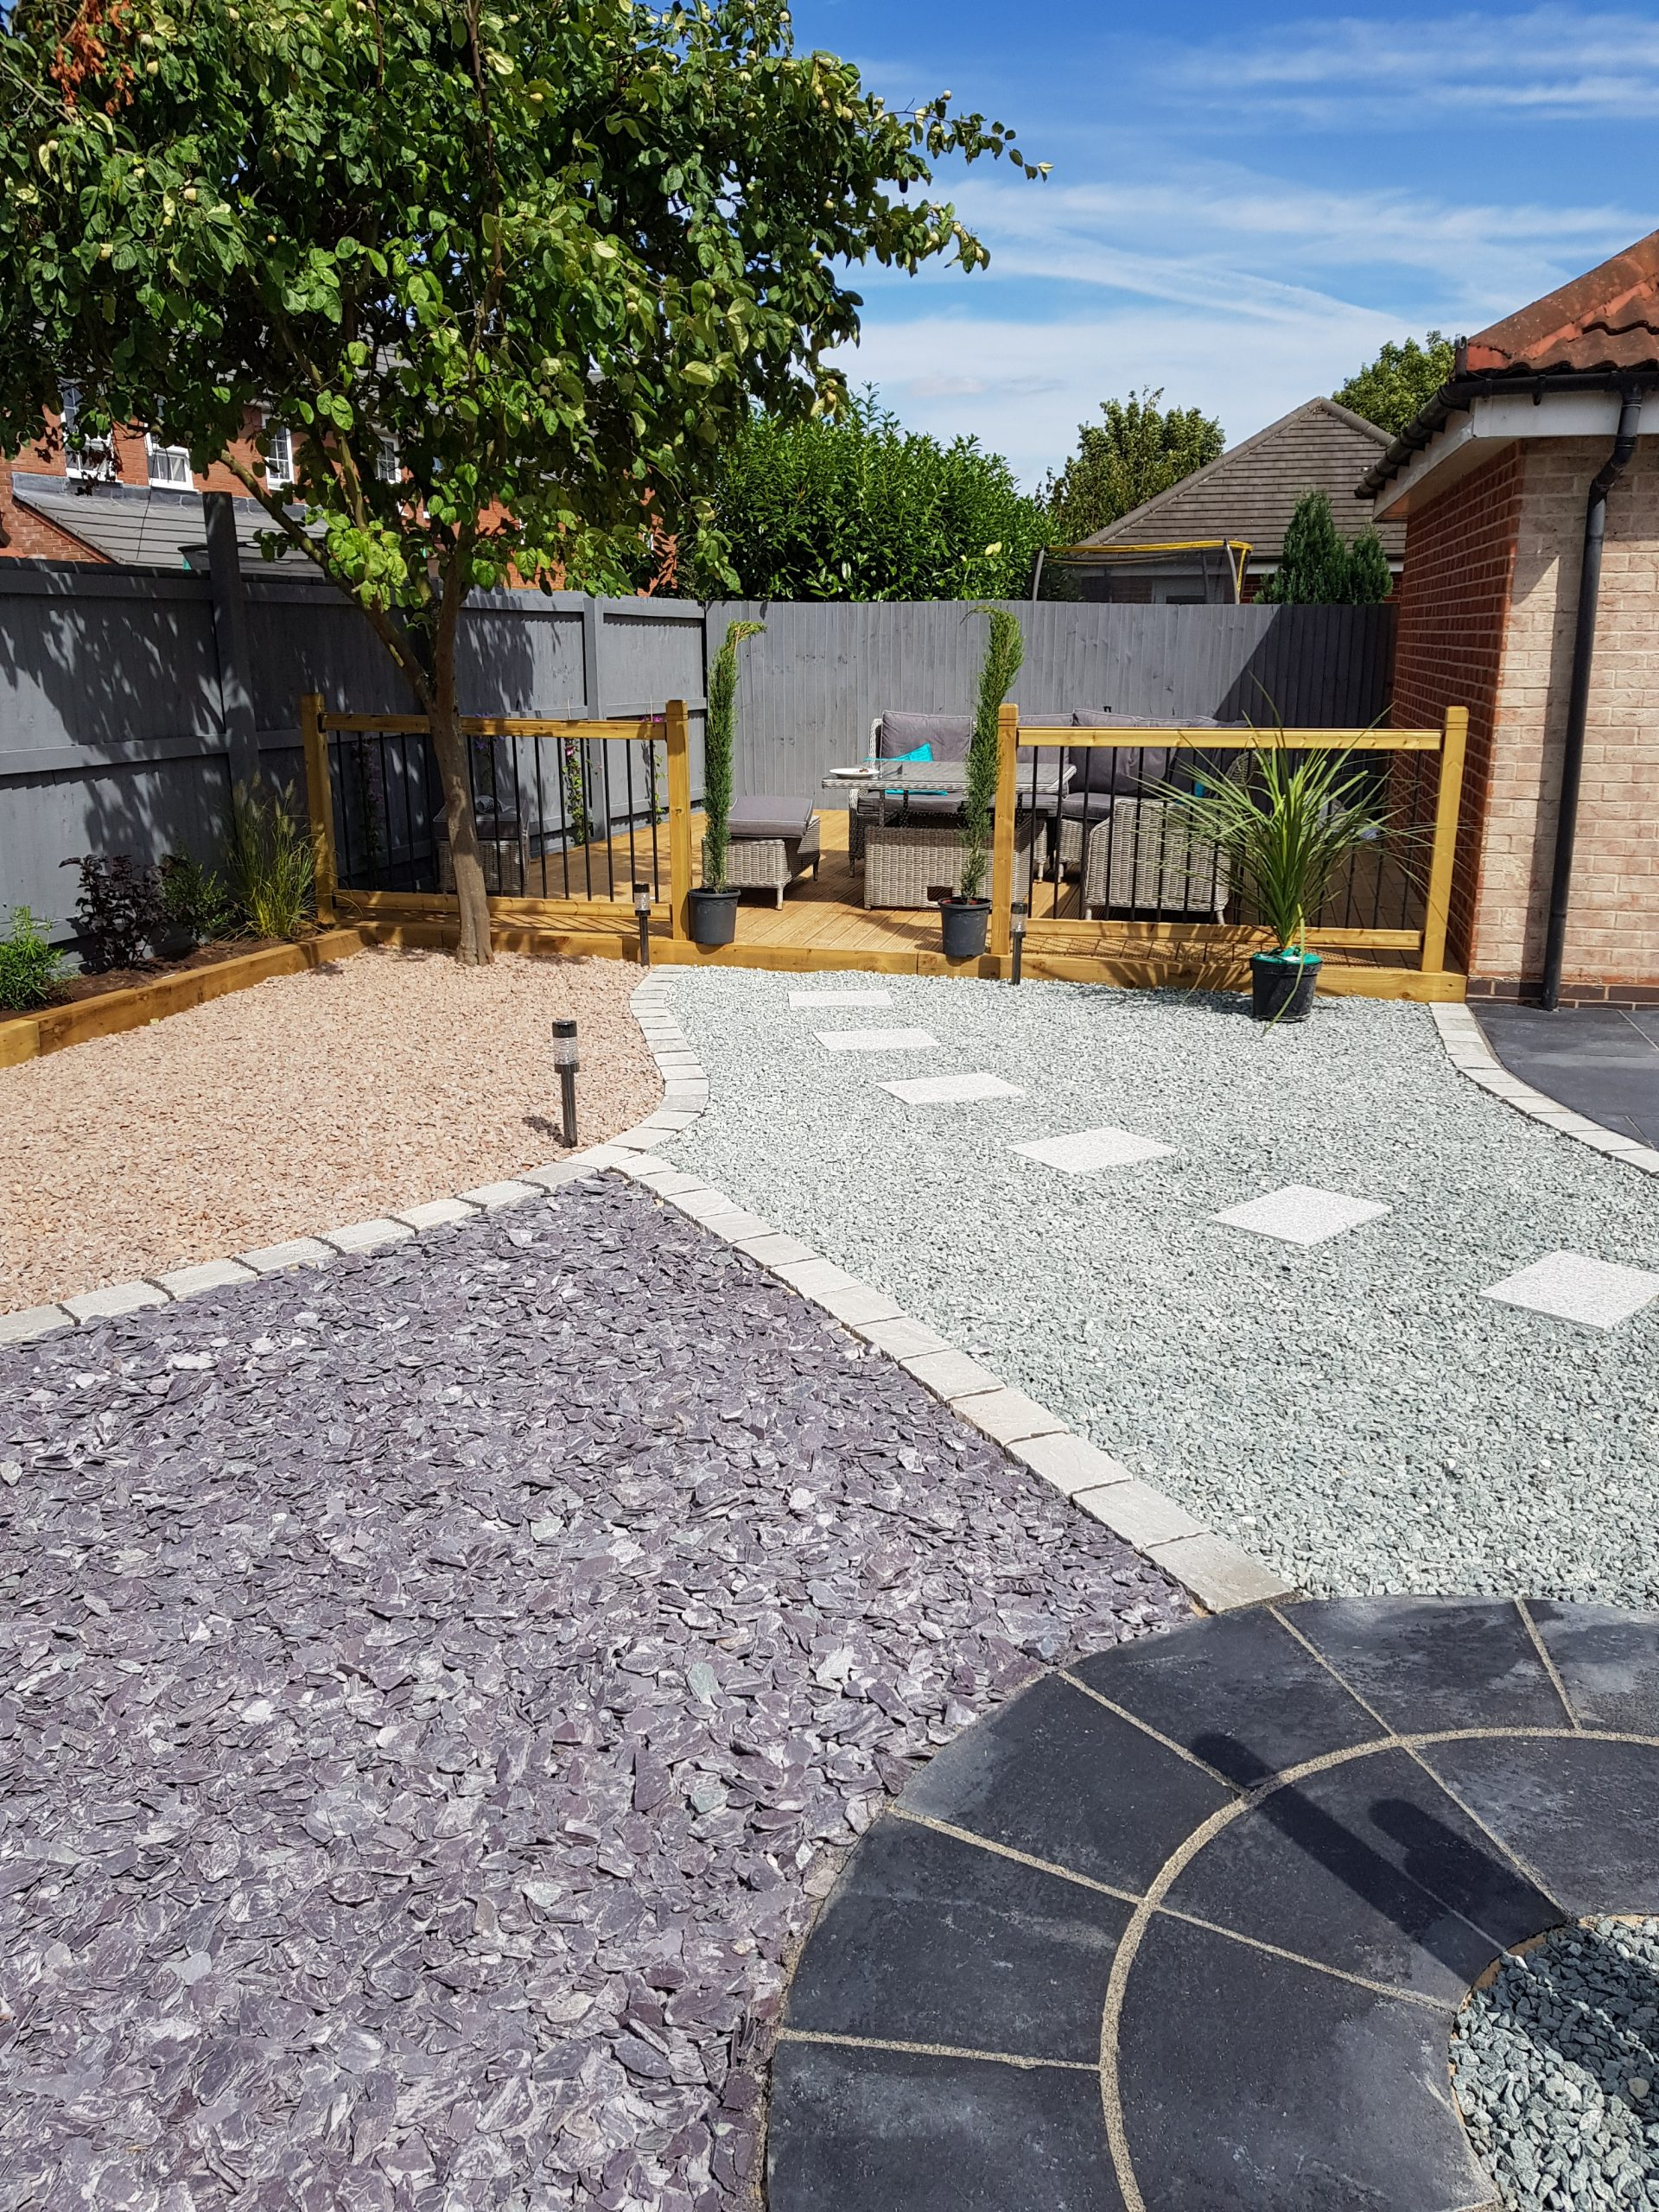 Garden transformation Newark, grey and plum slate, patio, raised wooden sleeper borders